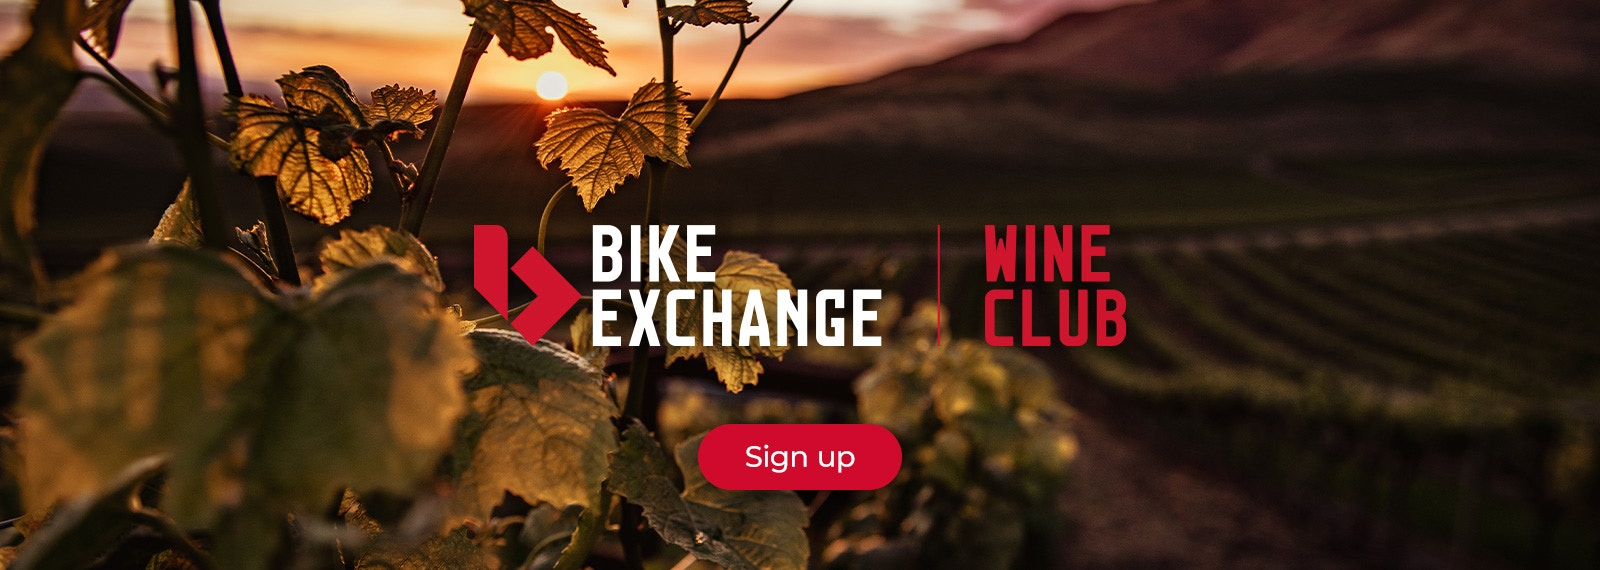 BikeExchange Wine Club